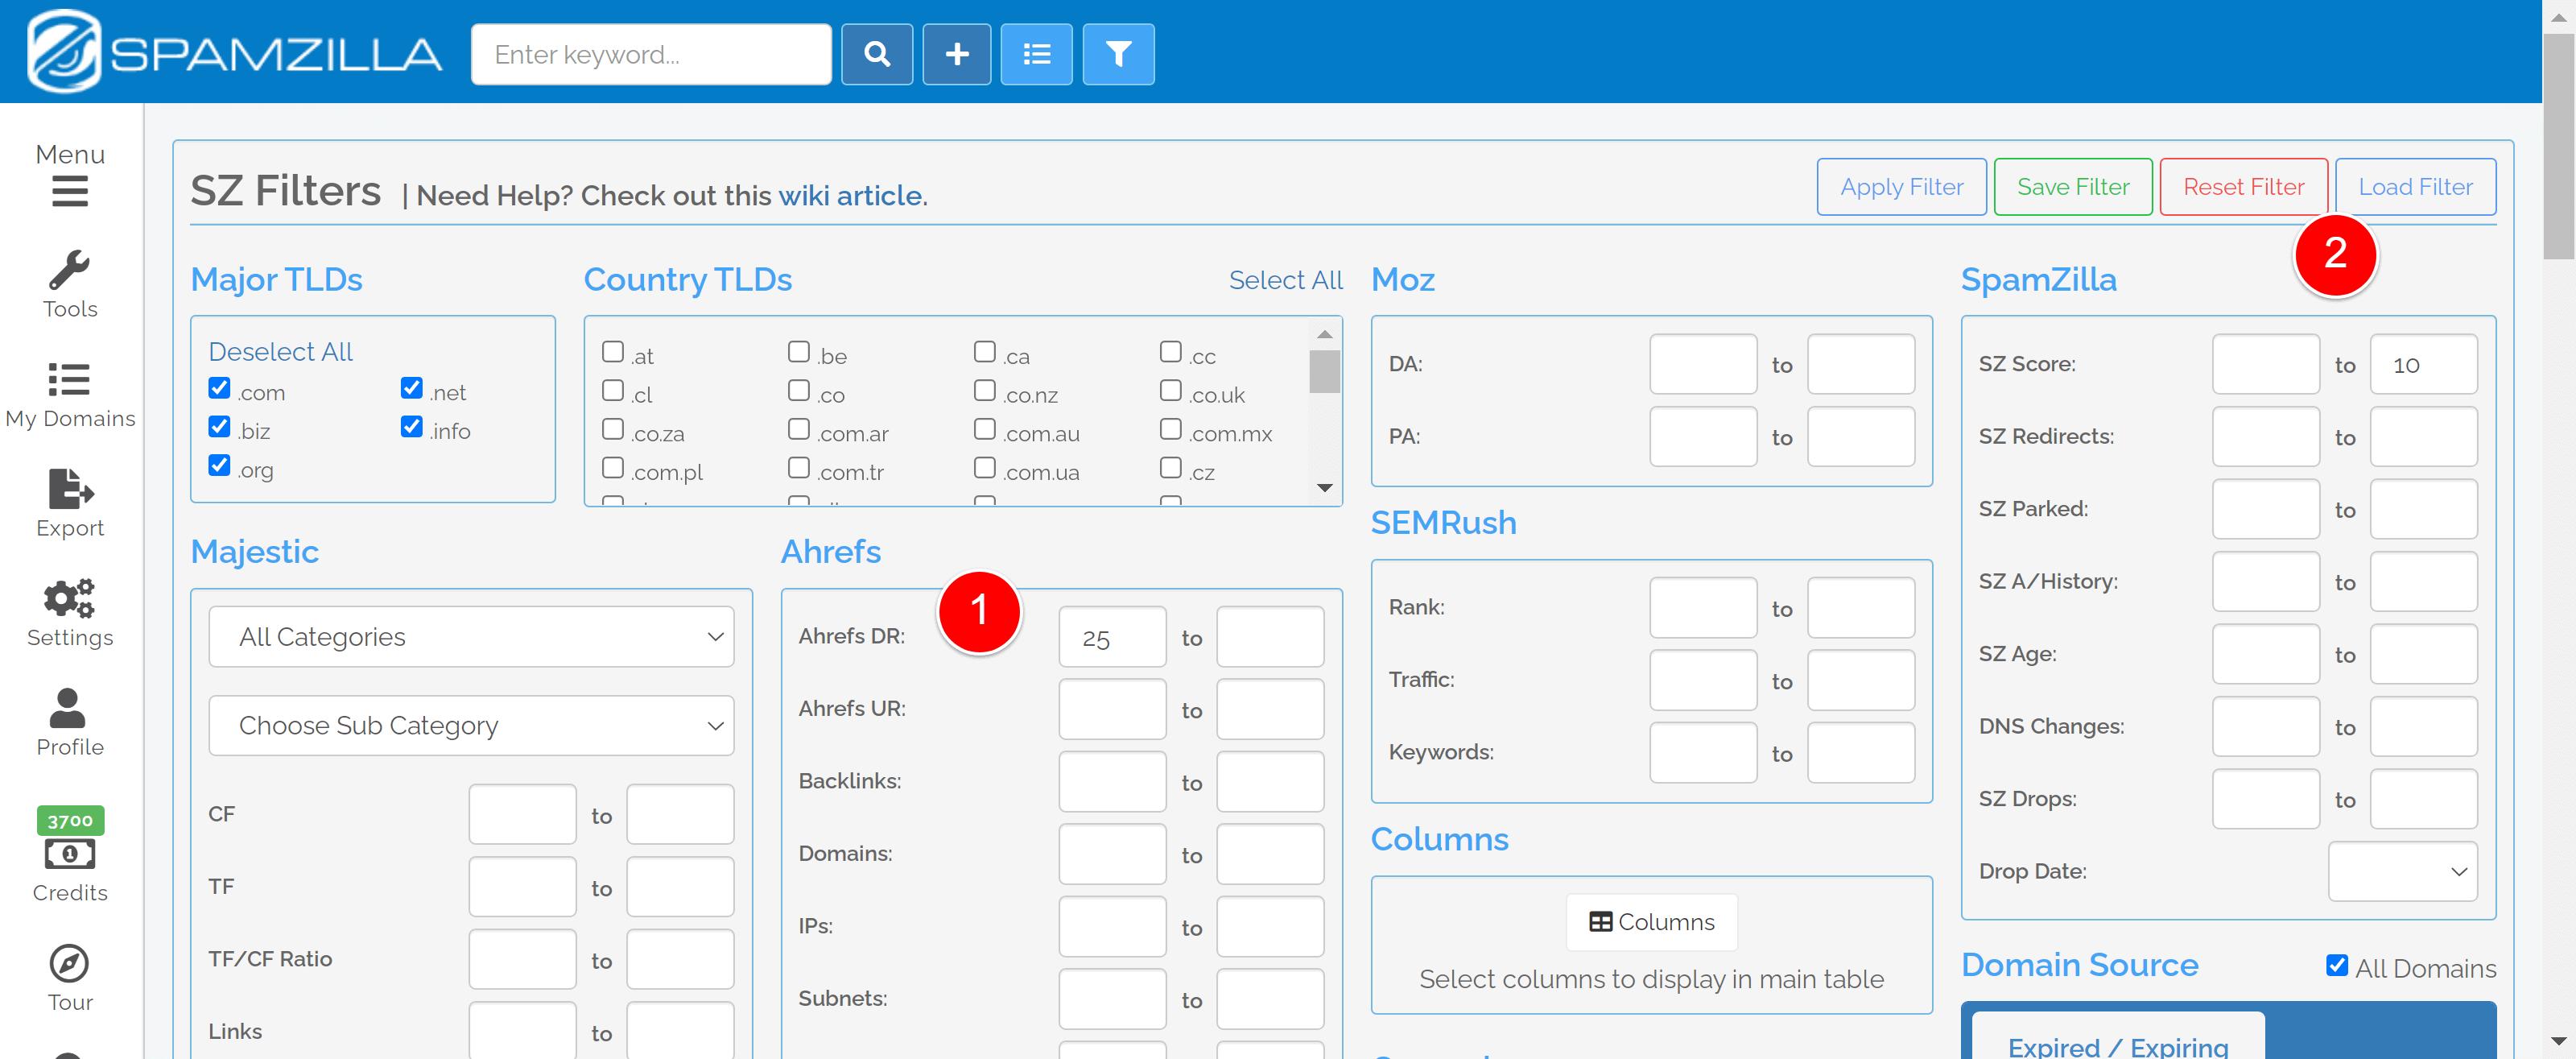 spamzilla filter example